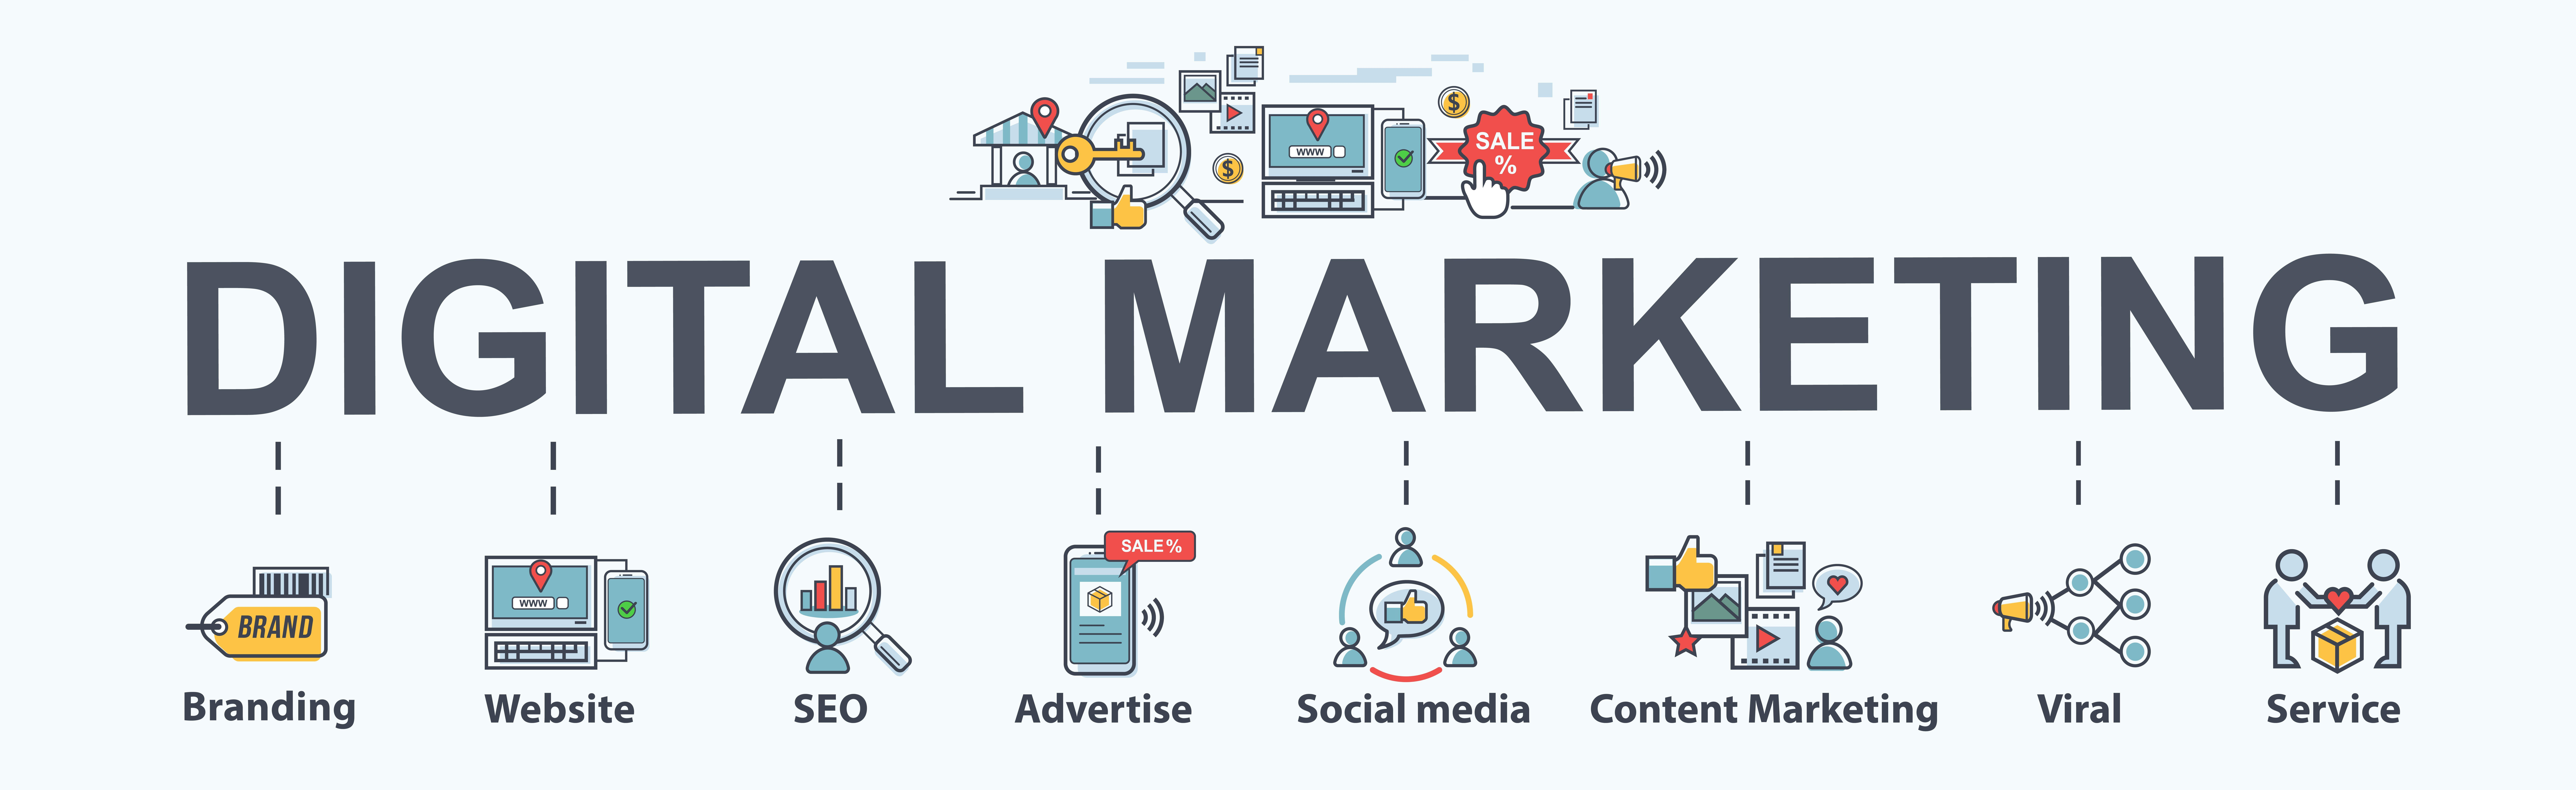 Digital Marketing Art